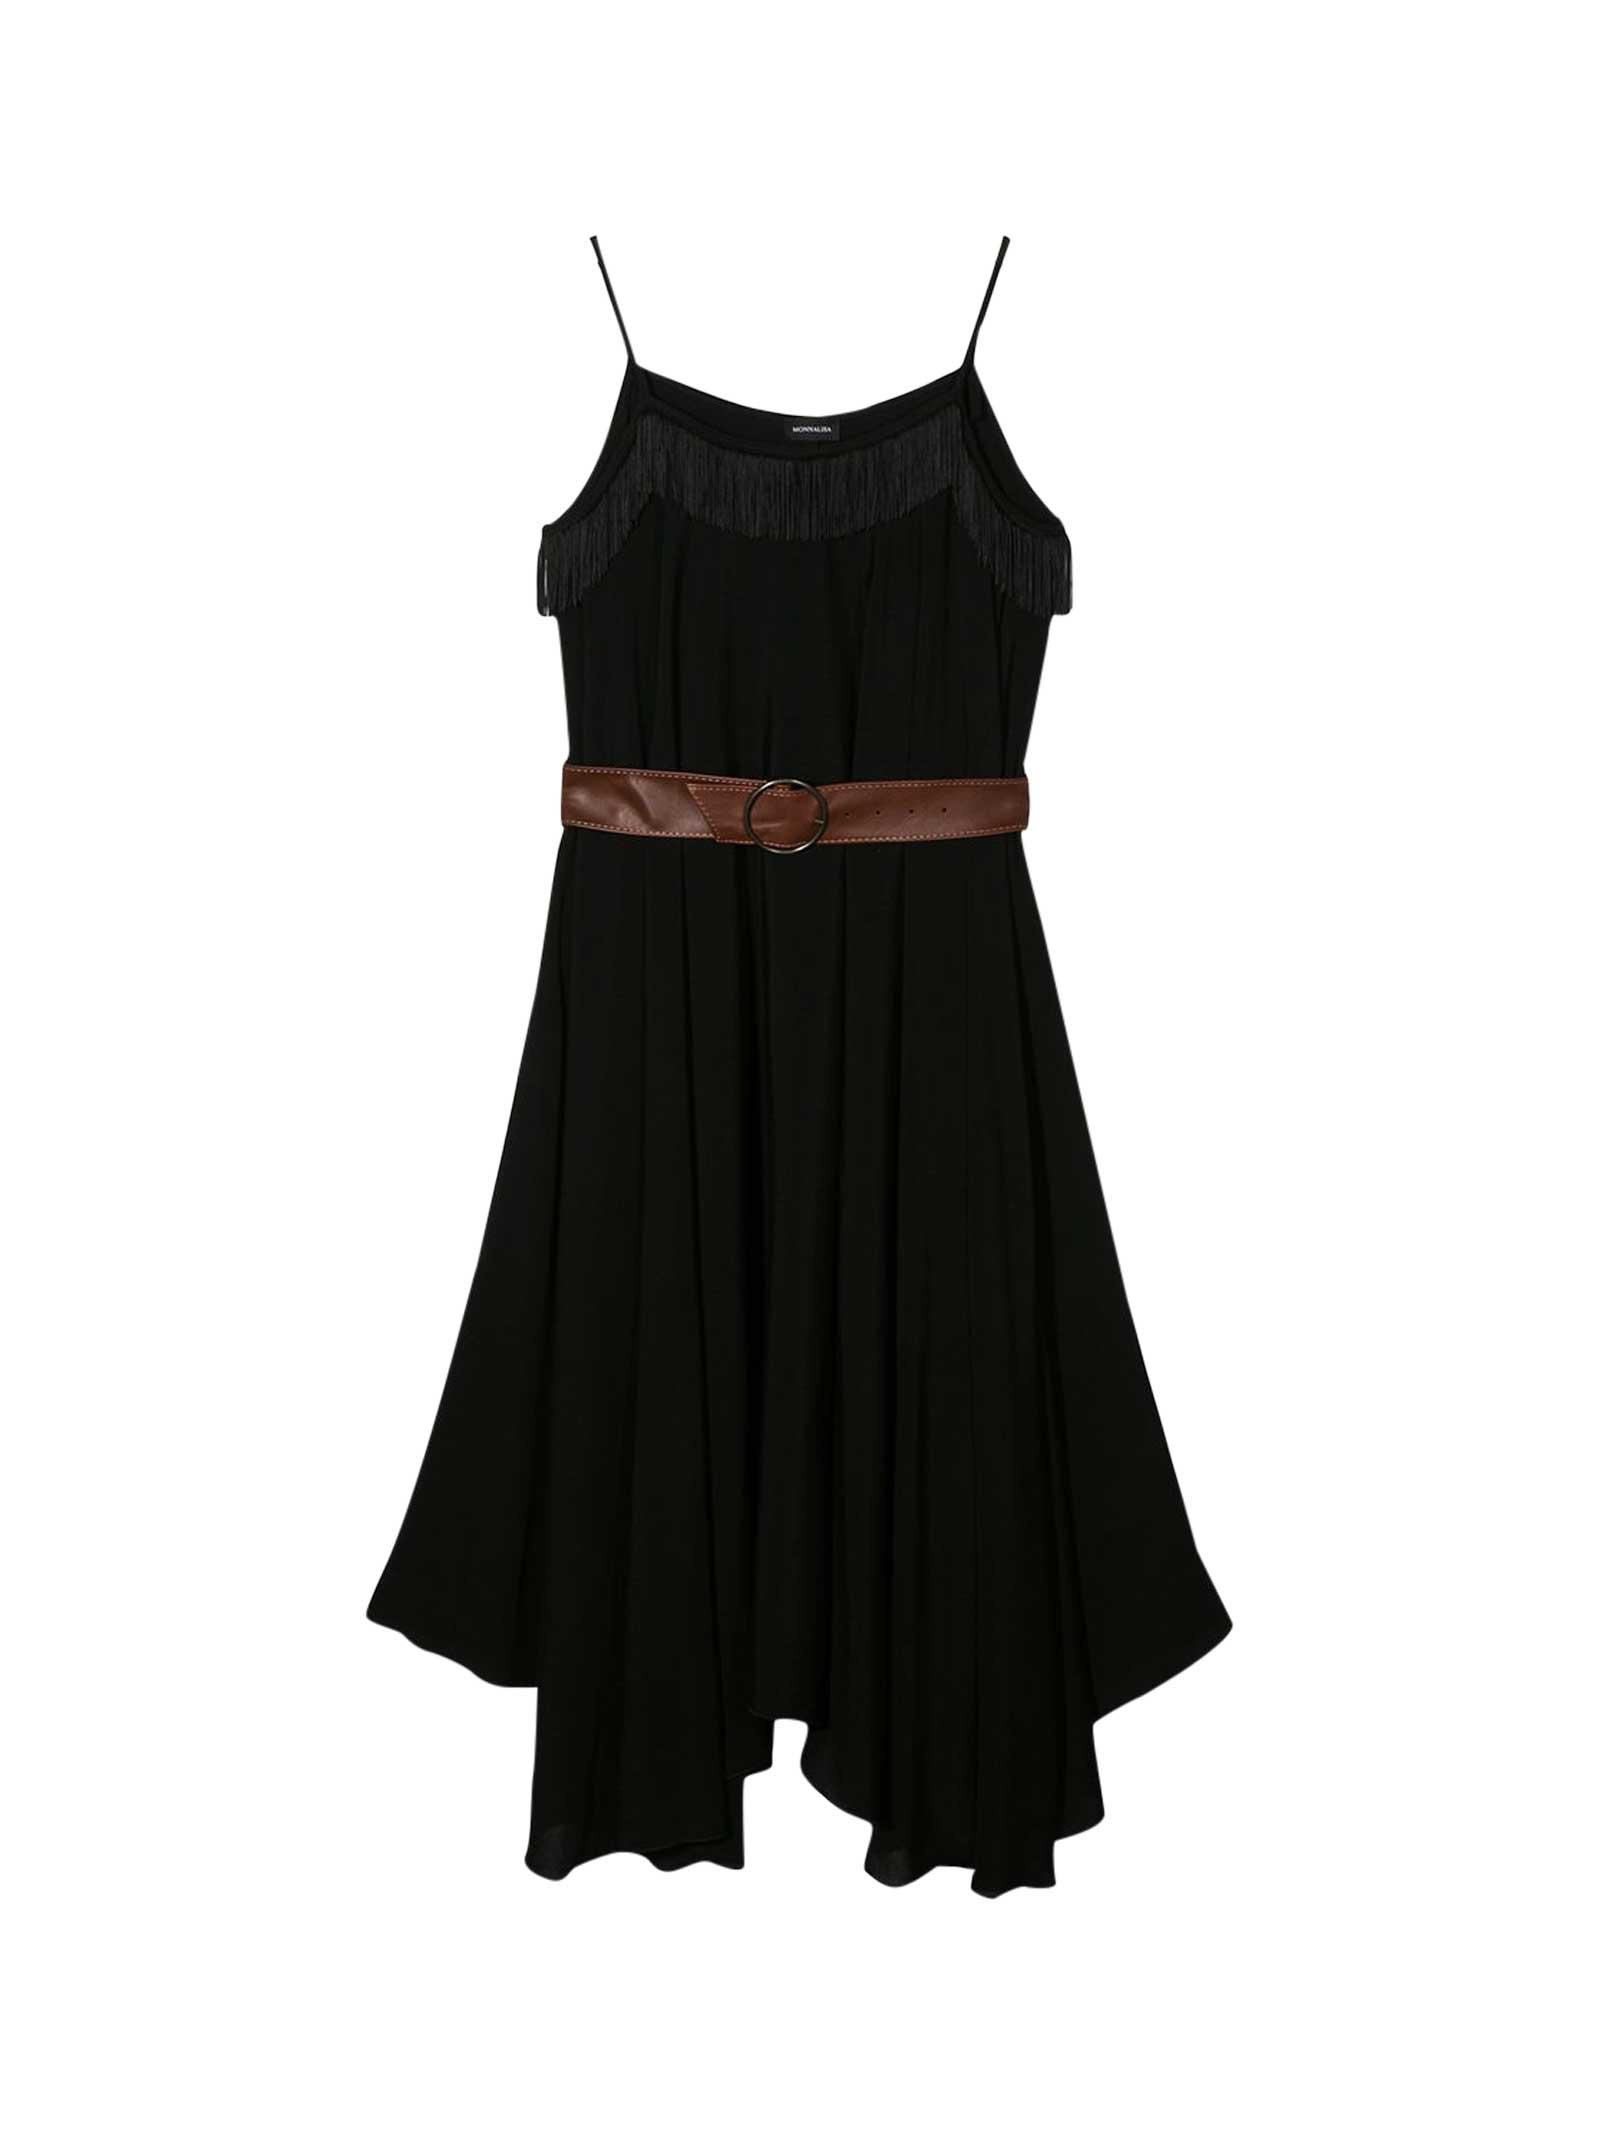 Buy Monnalisa Long Black Dress With Belt online, shop Monnalisa with free shipping